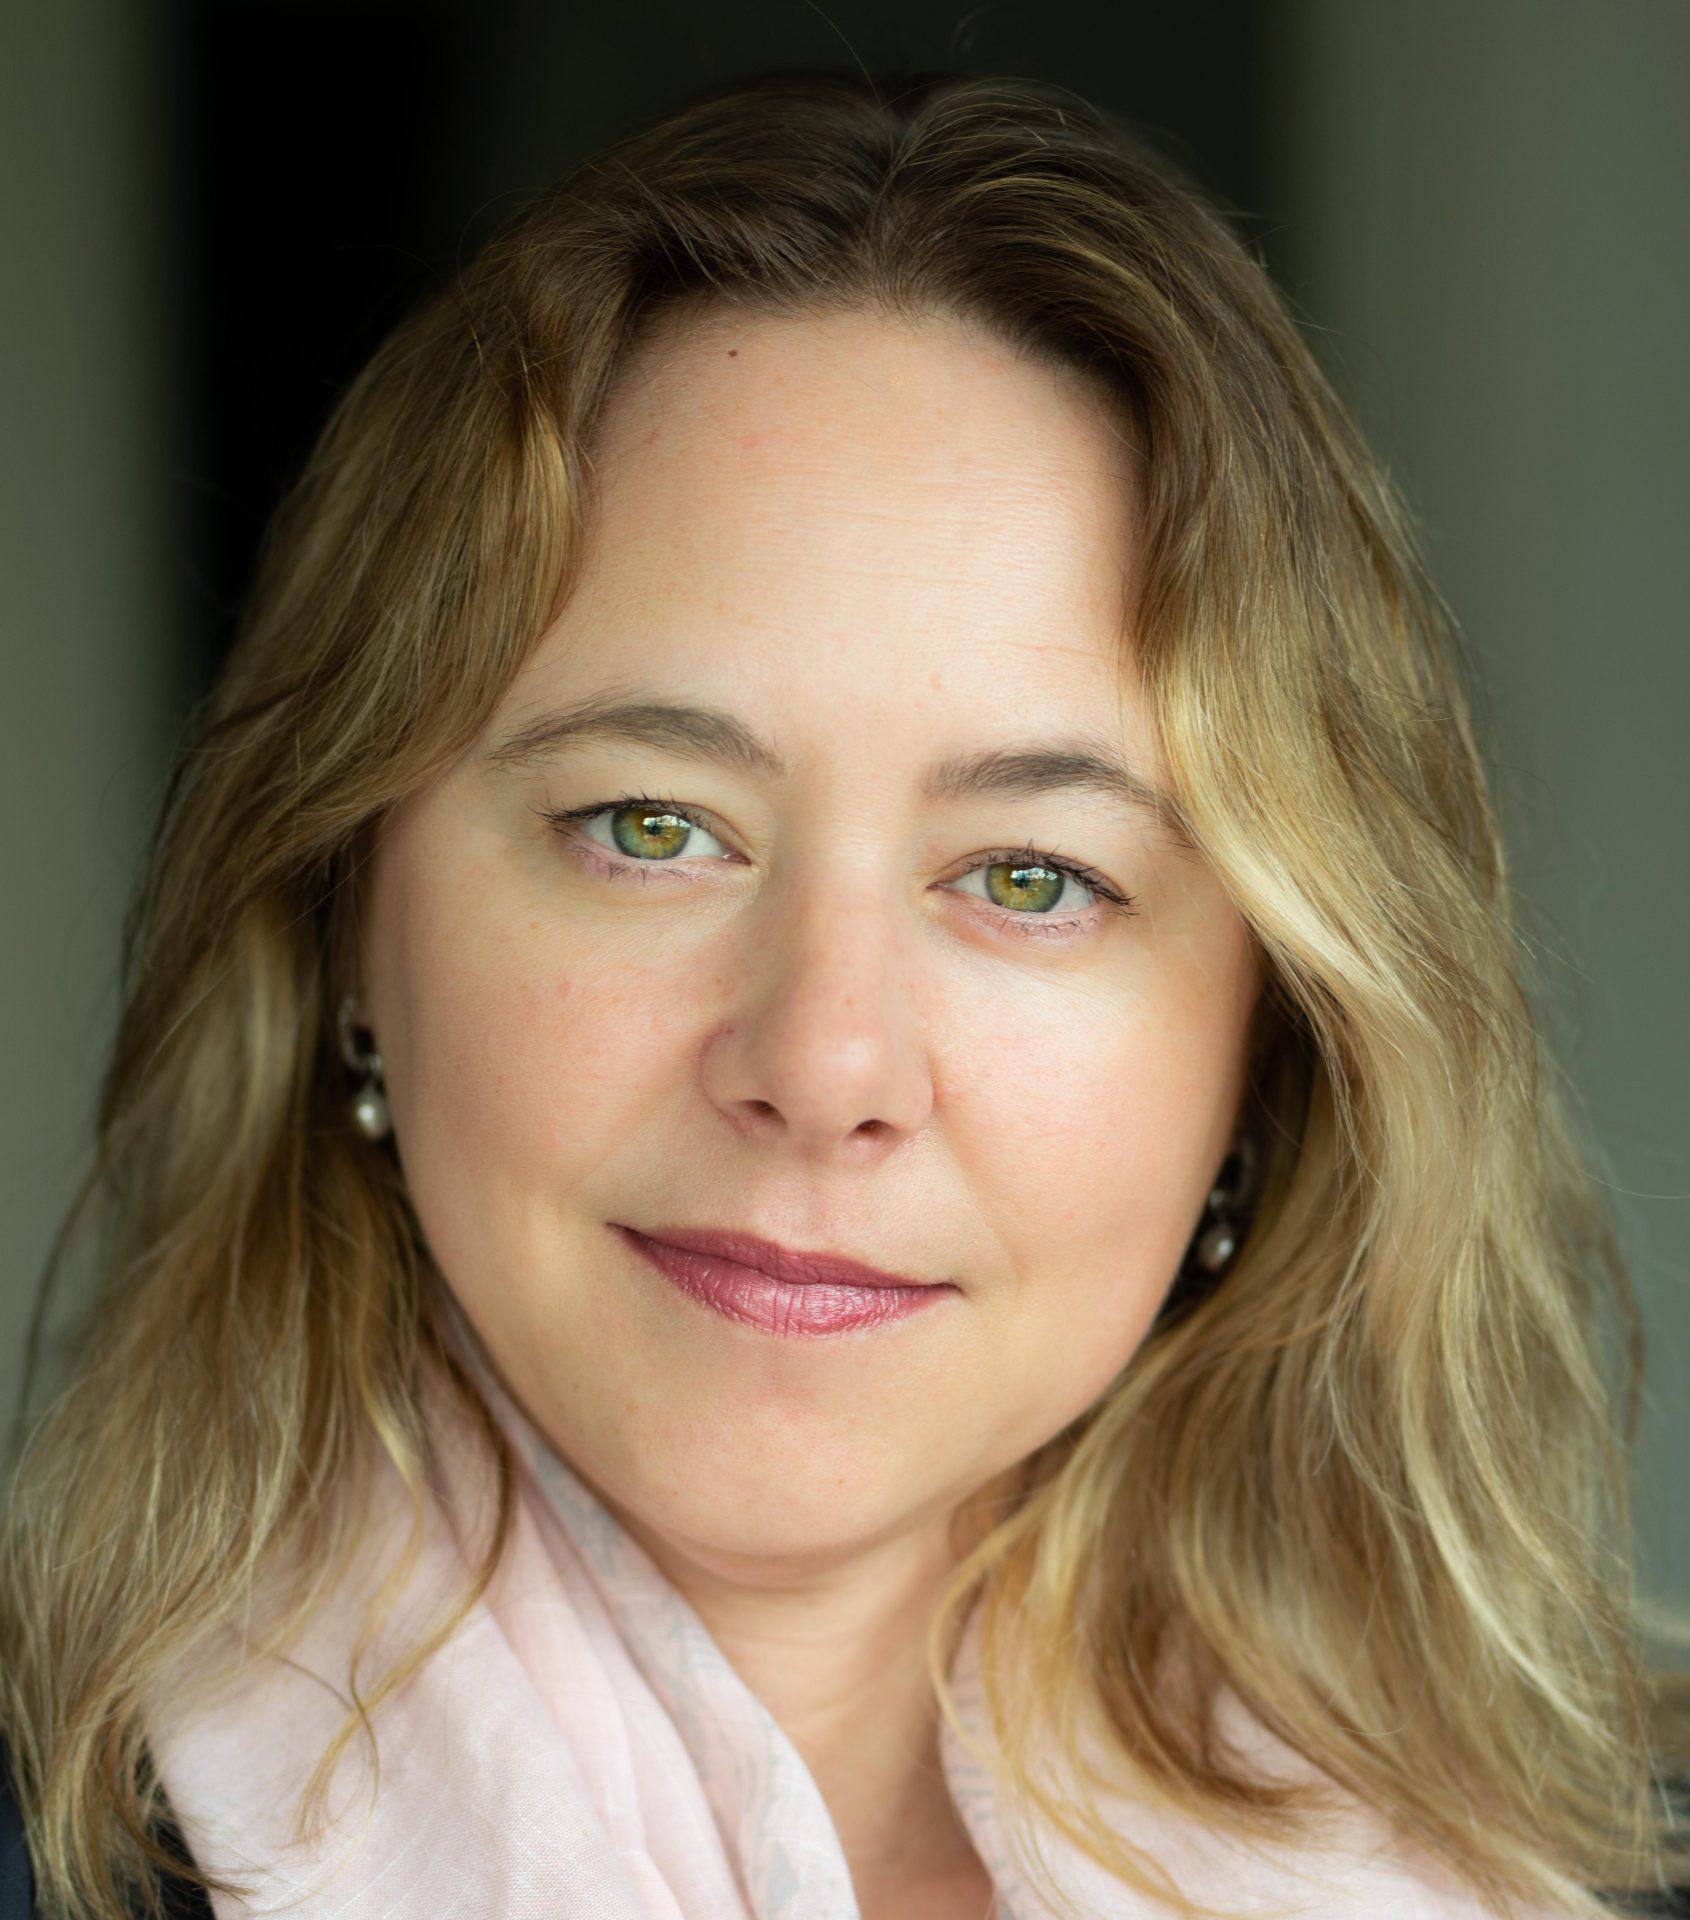 Profielfoto van Zo'e Houbolt-Wit